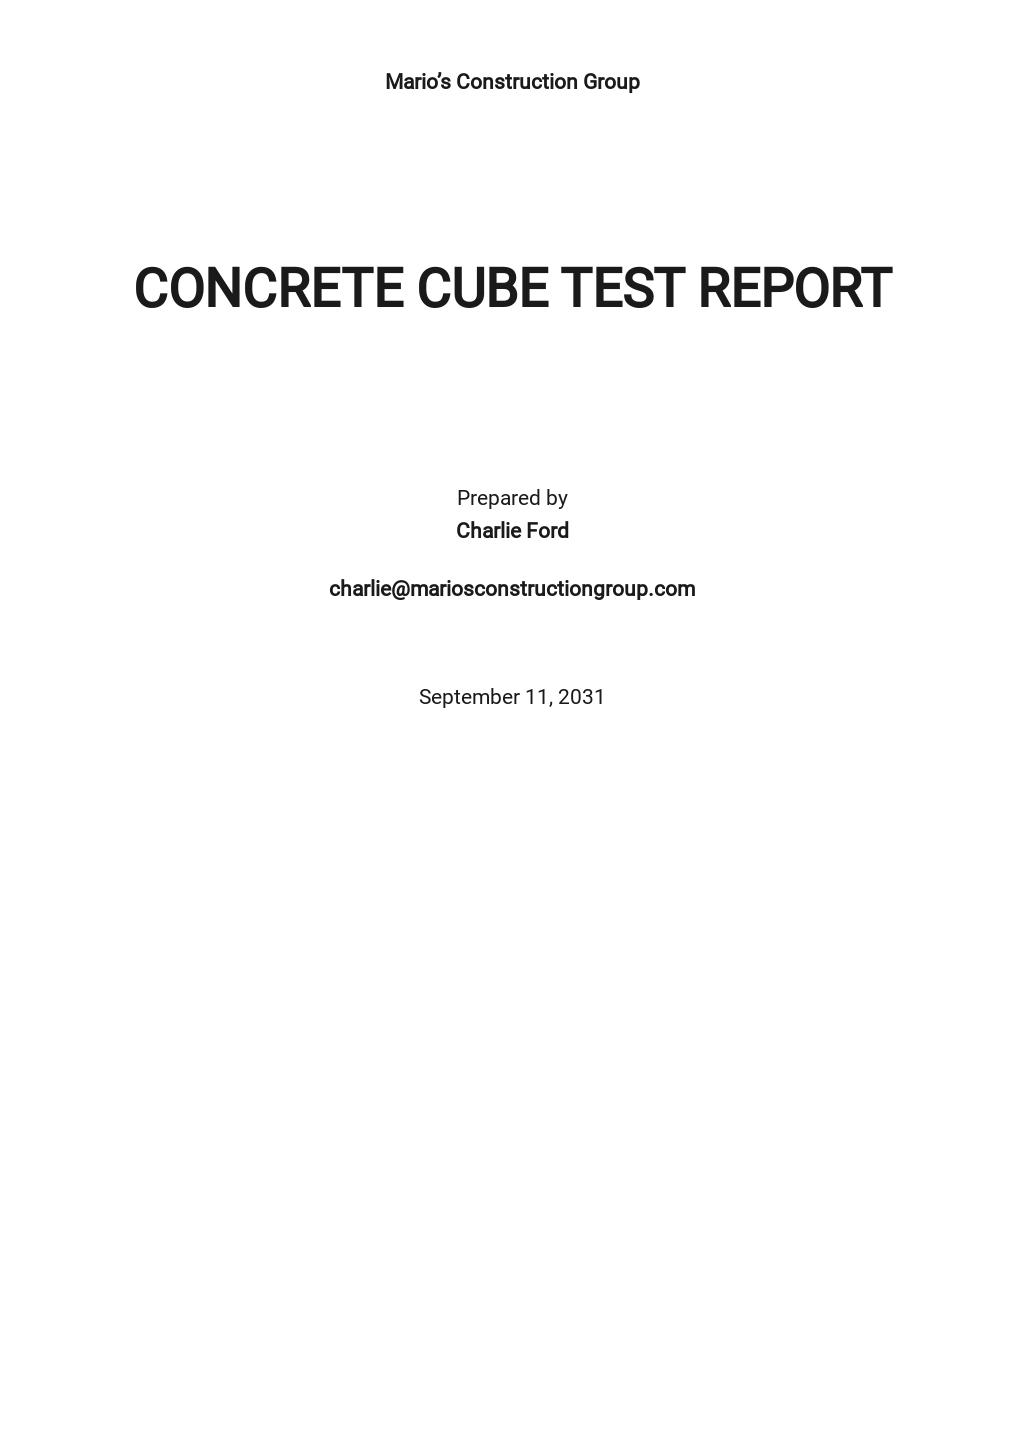 Concrete Cube Test Report Template.jpe